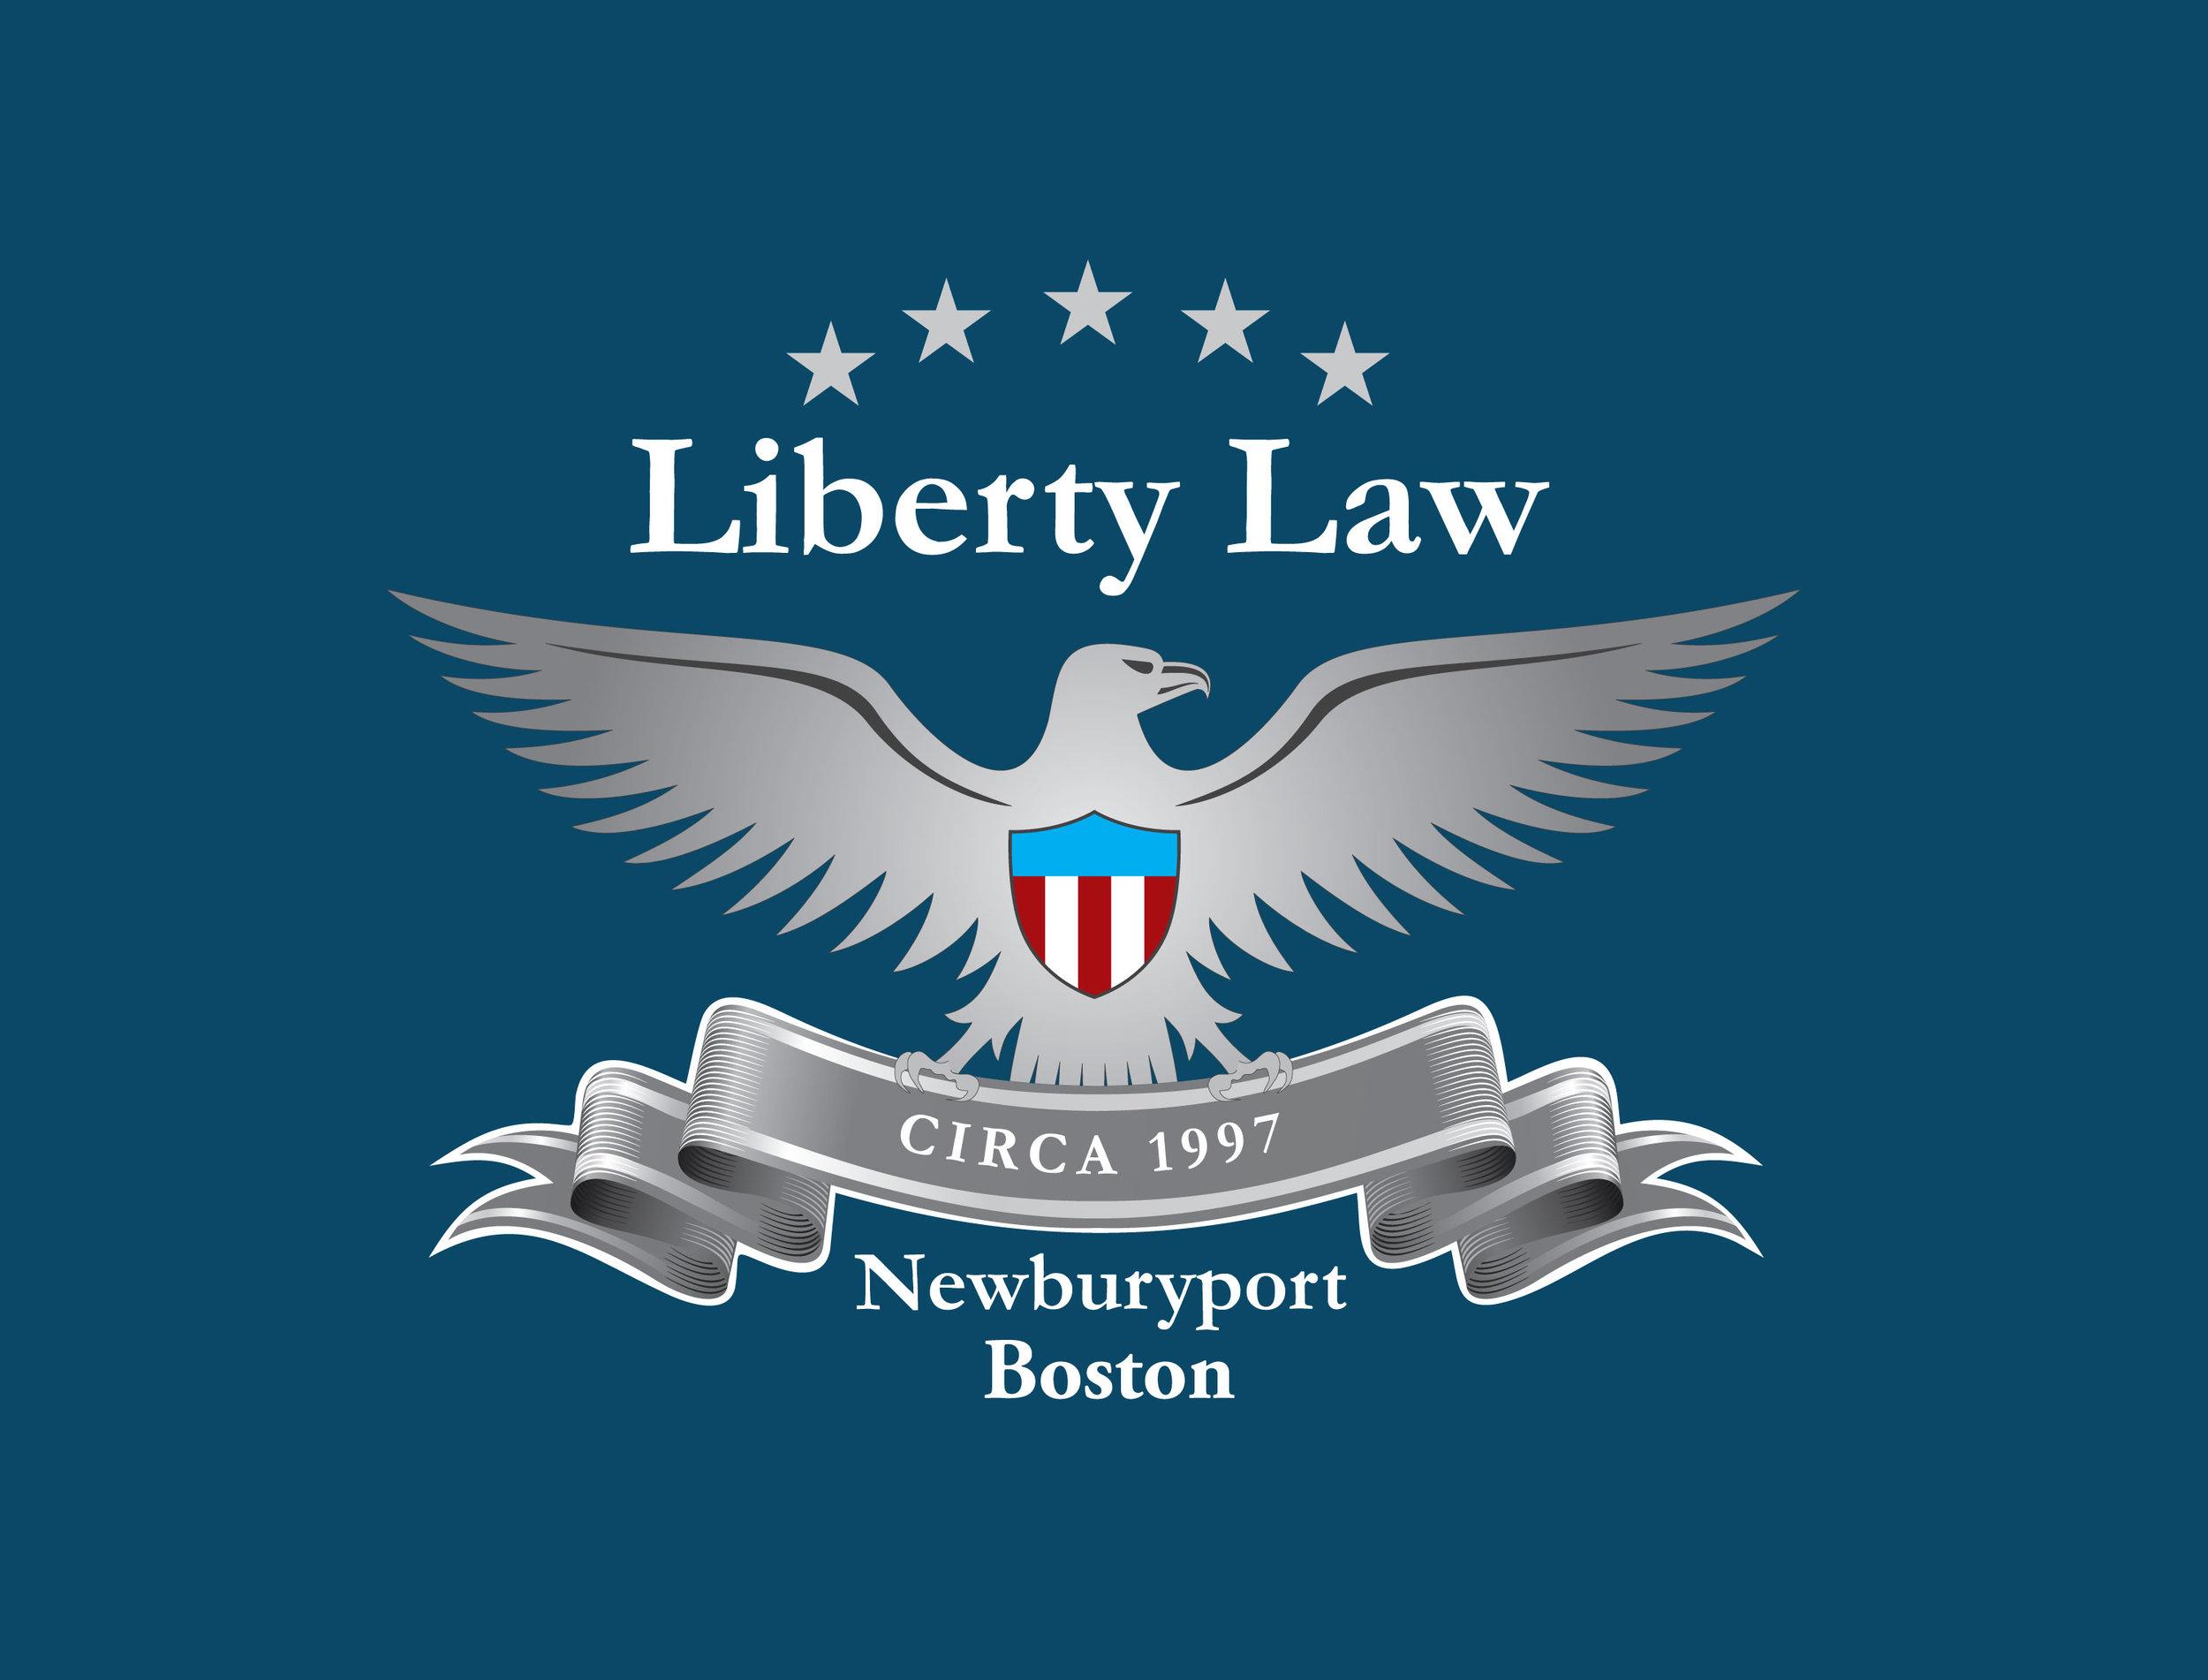 Lib-Law--Logo-c1997.jpg